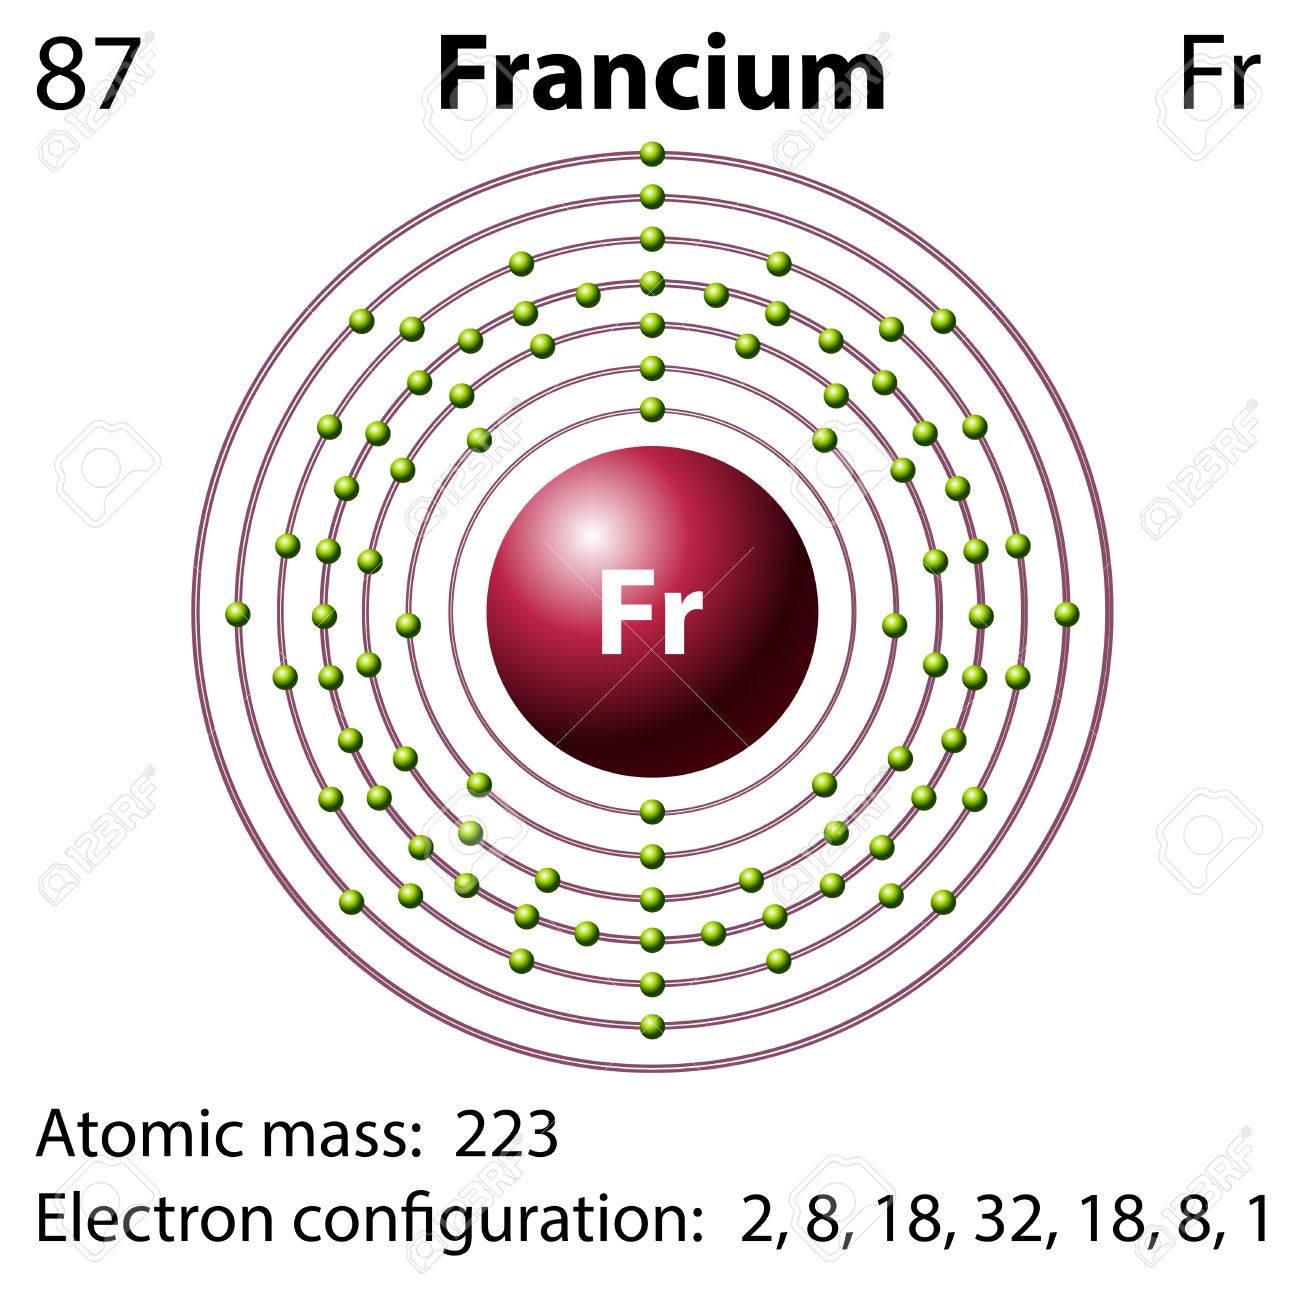 Good Diagram Representation Of The Element Francium Illustration Stock Vector    44789366